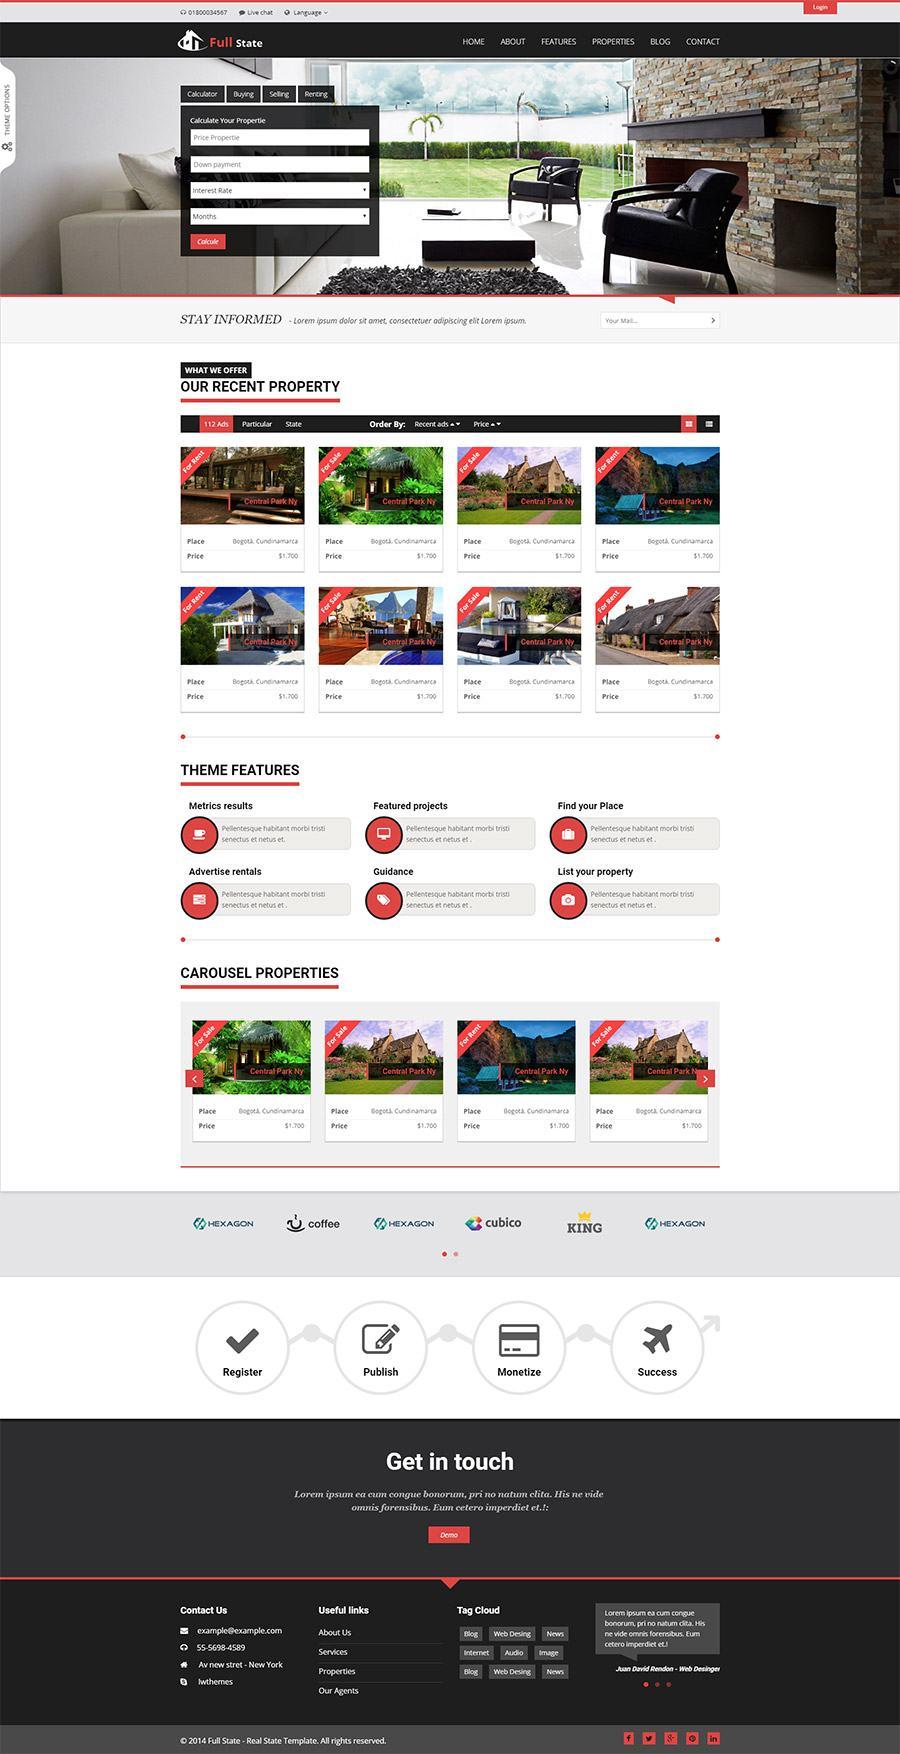 Giao diện website bất động sản Full State